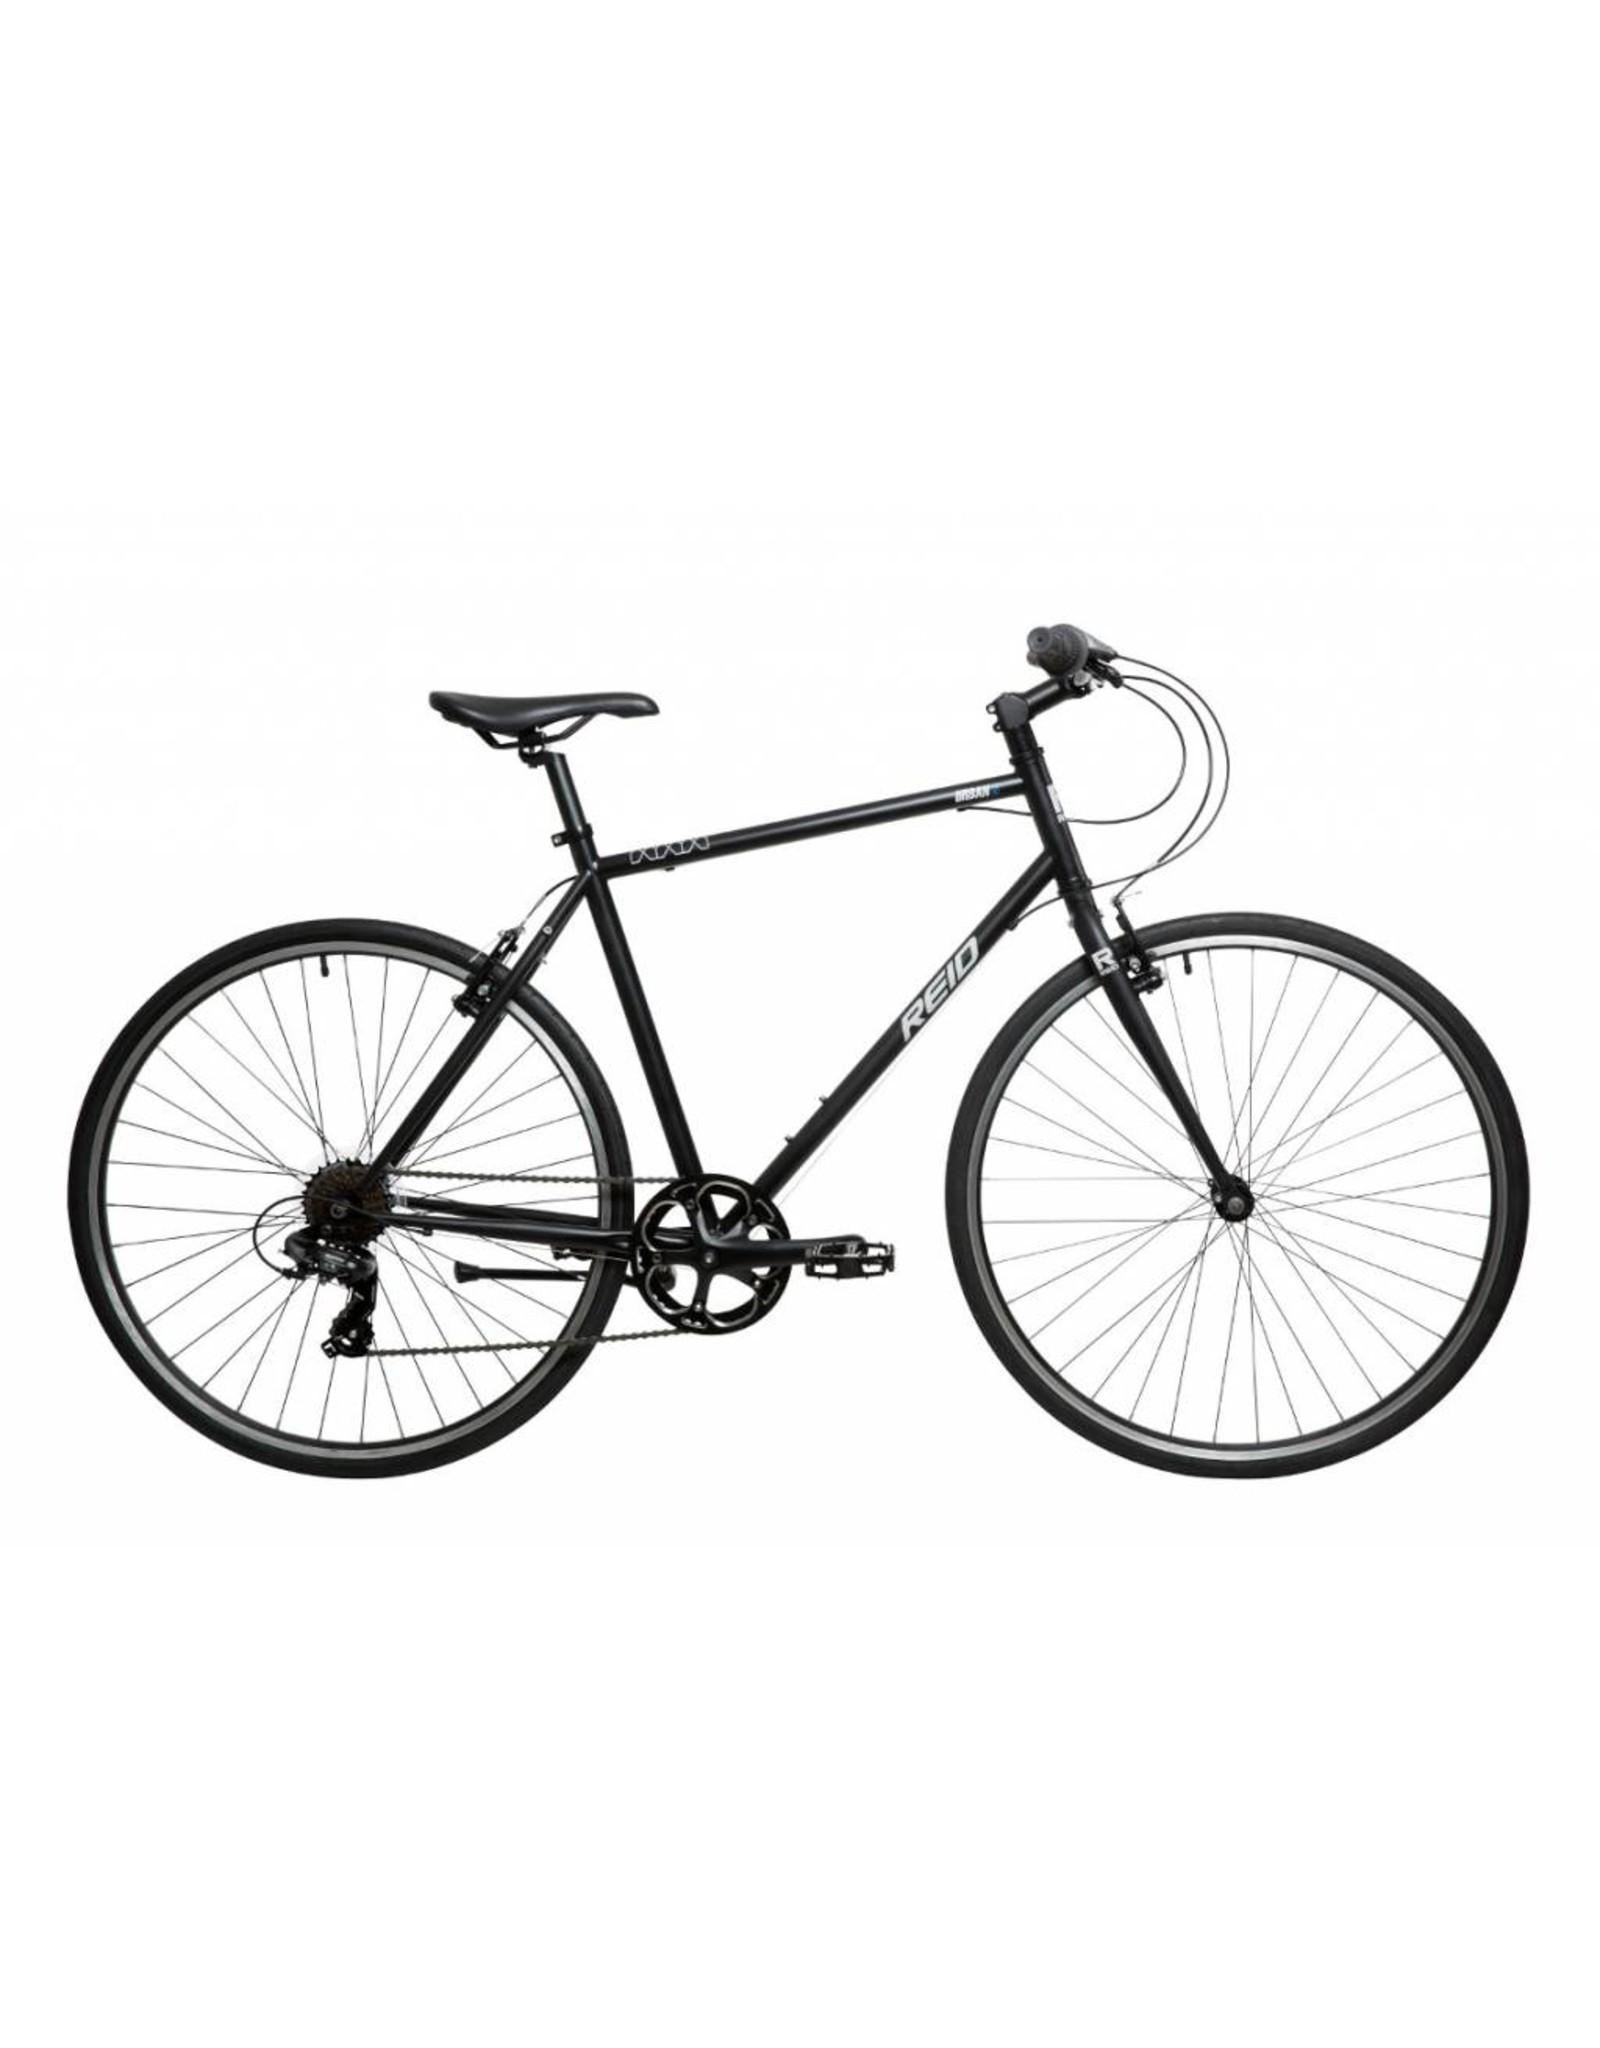 Reid City bike - REID Urban S